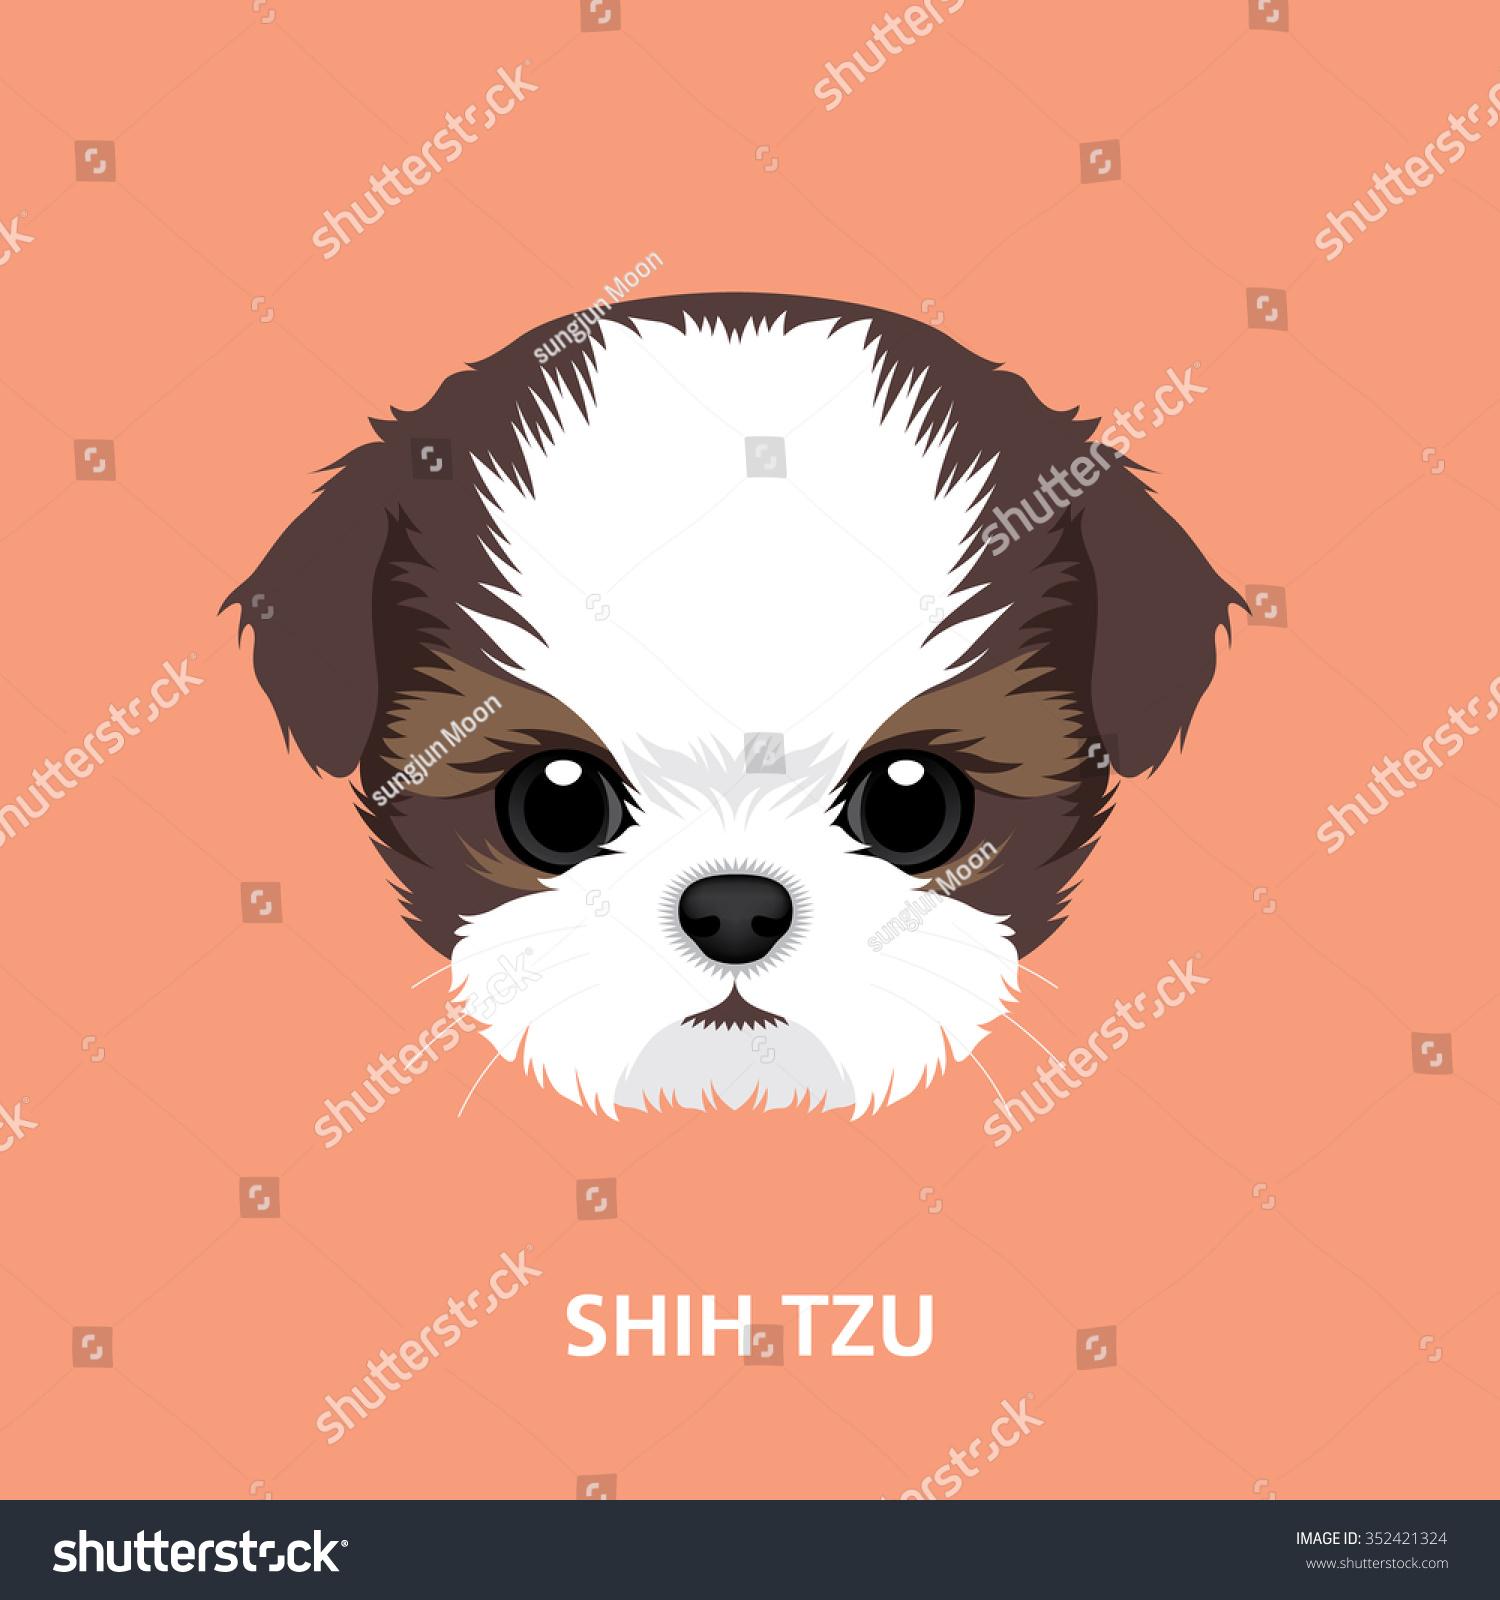 Vector Illustration Portrait Shihtzu Puppy Art Stock Vector Royalty Free 352421324